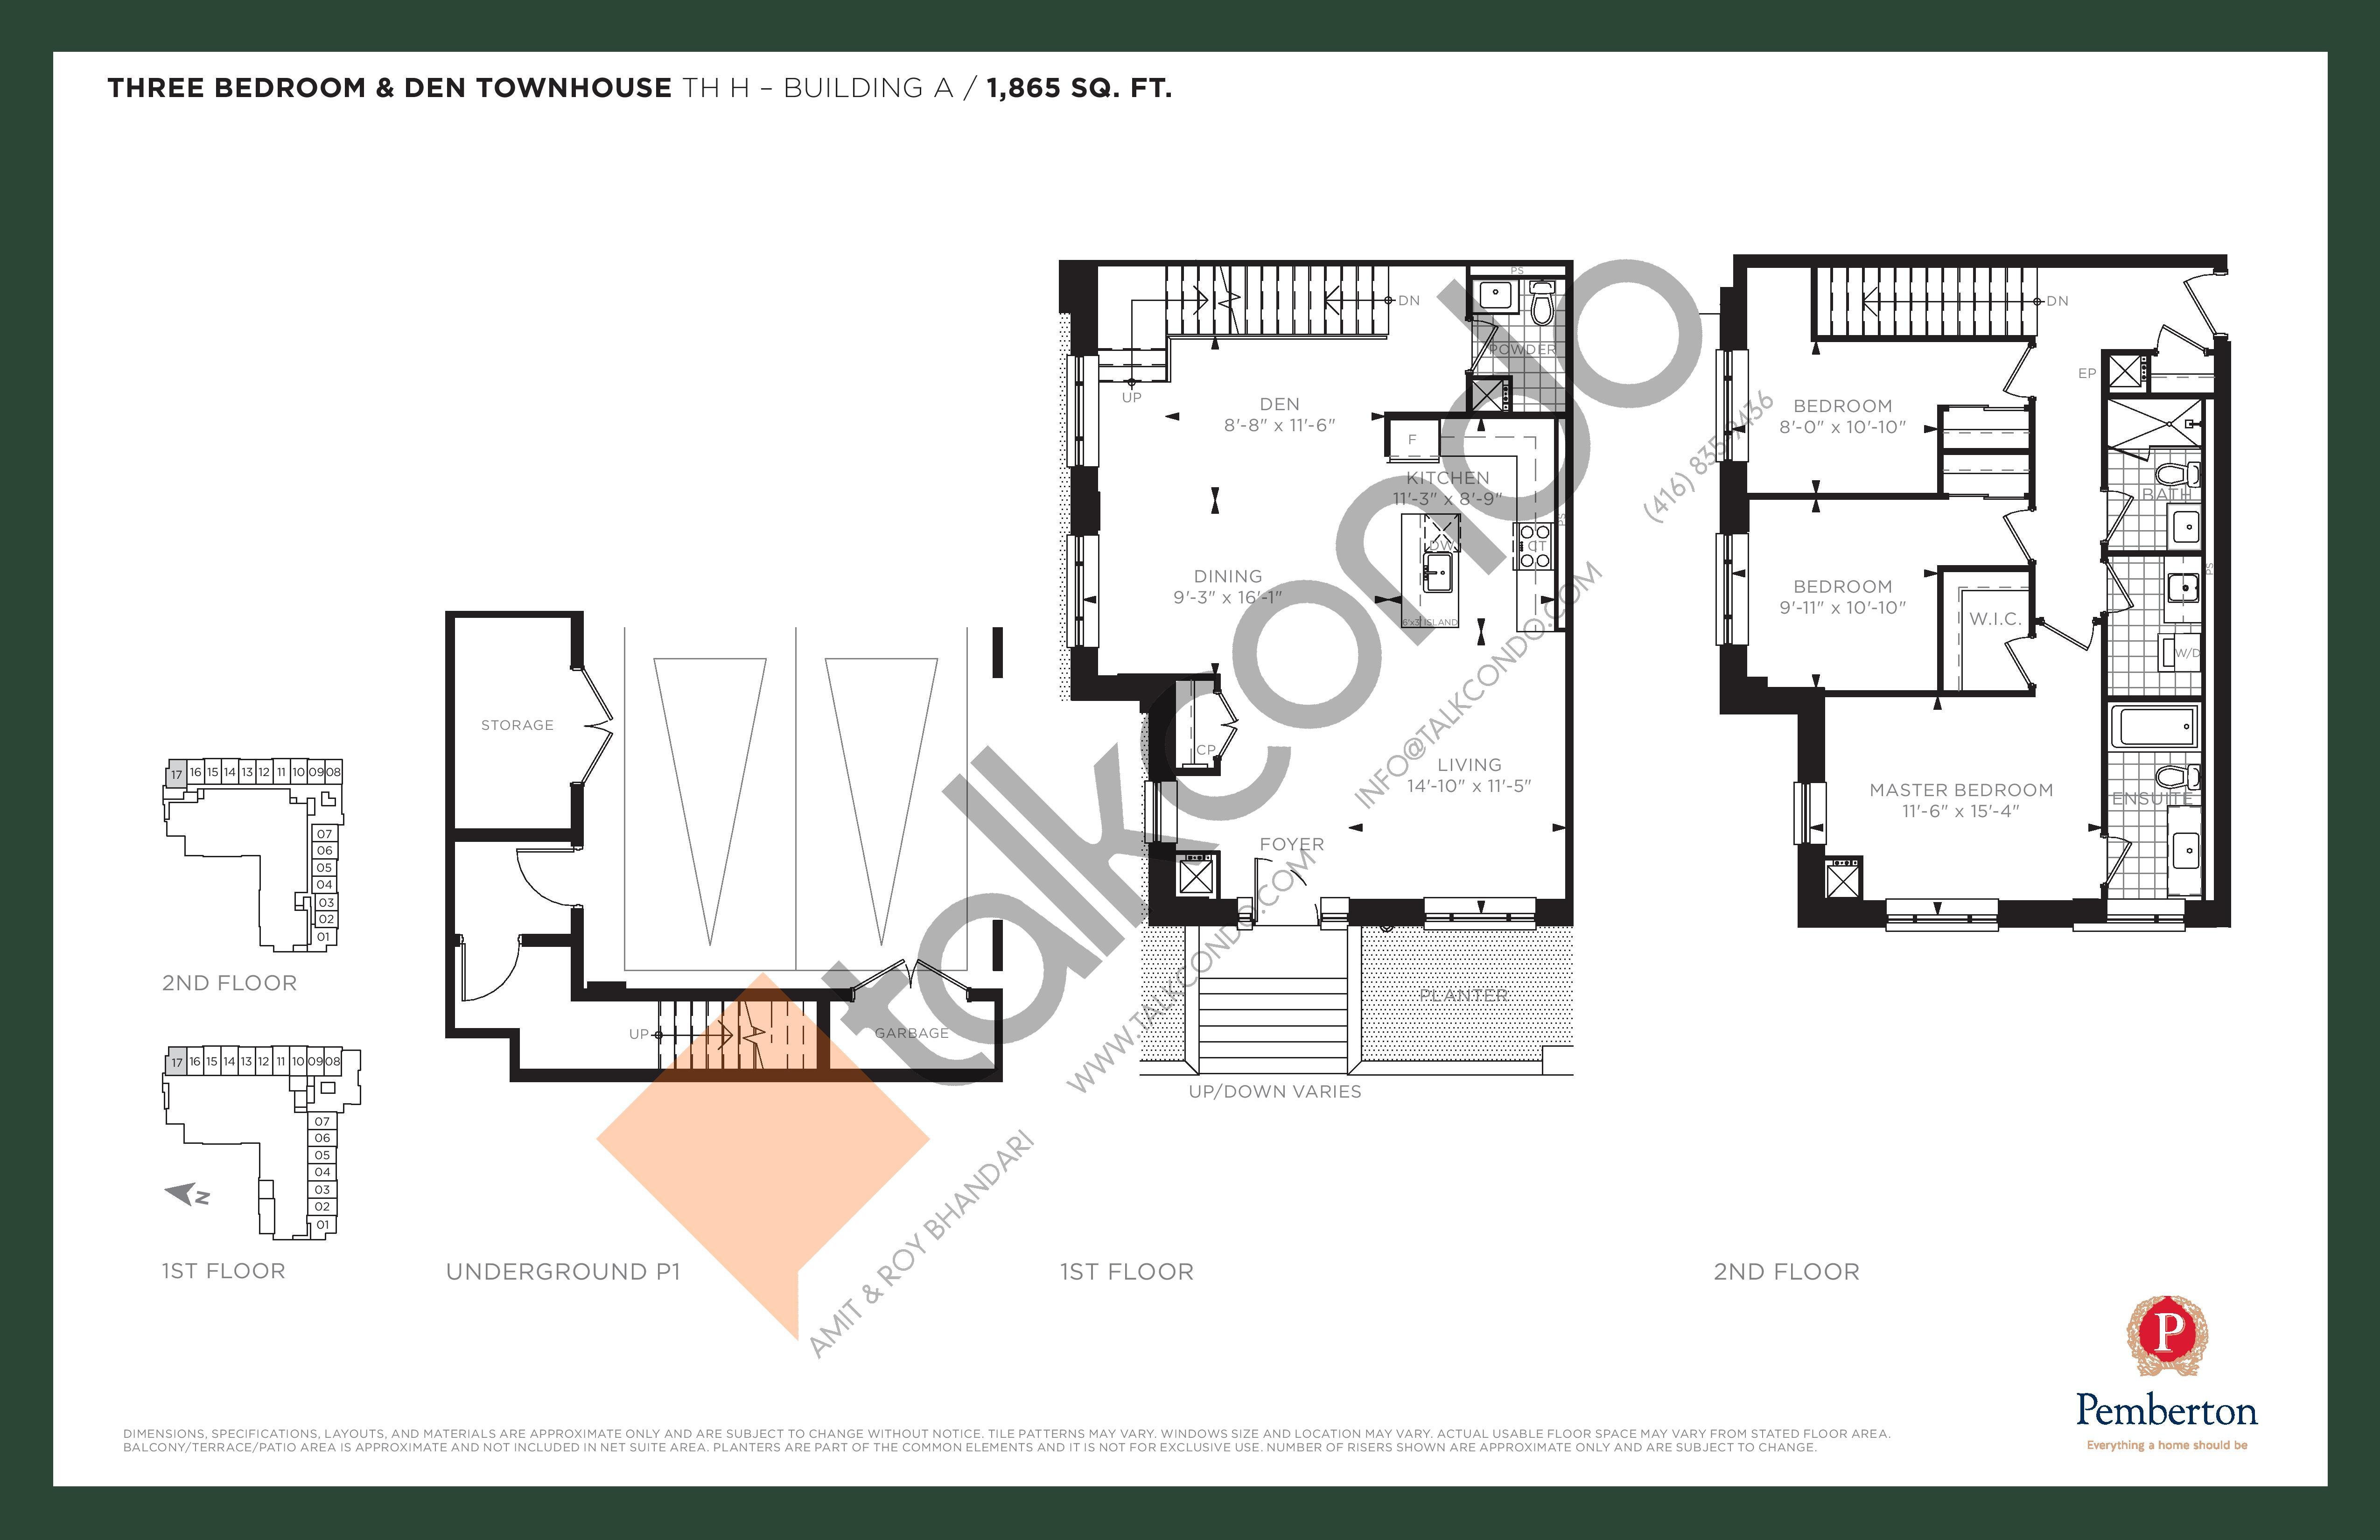 TH H - Building A Floor Plan at 9th & Main Condos + Towns - 1865 sq.ft